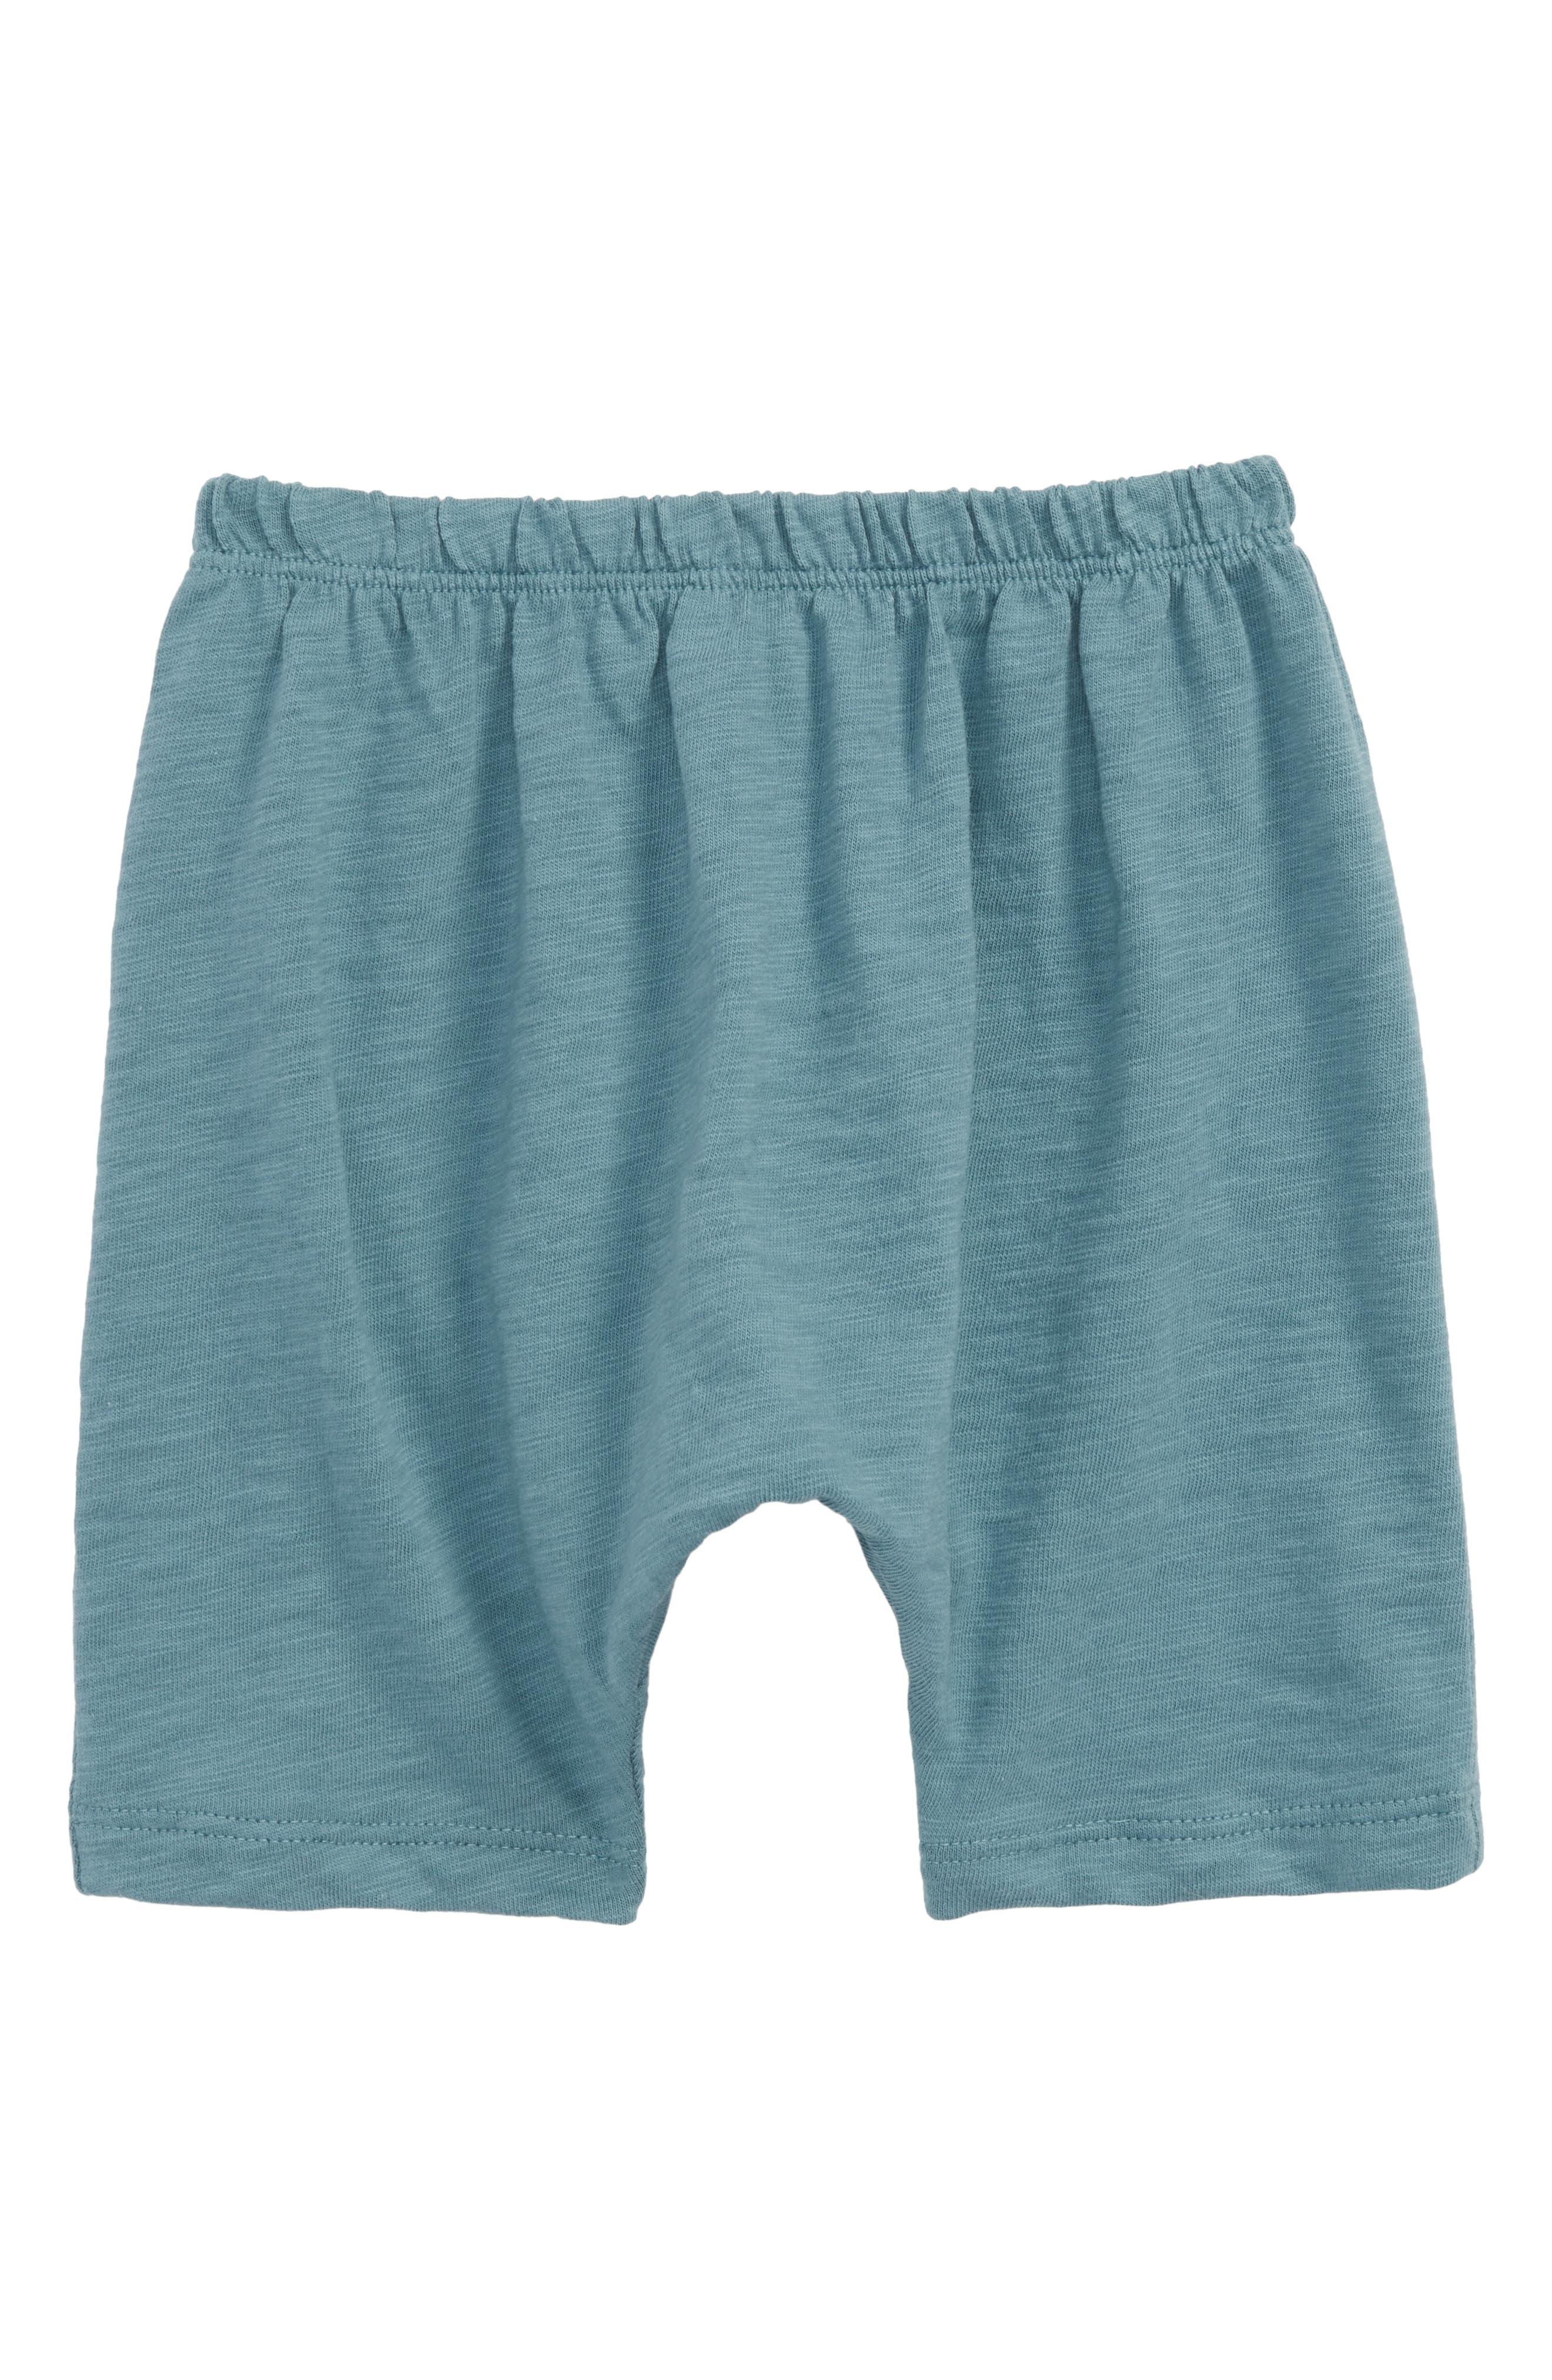 Peek Happy Shorts,                             Main thumbnail 1, color,                             400